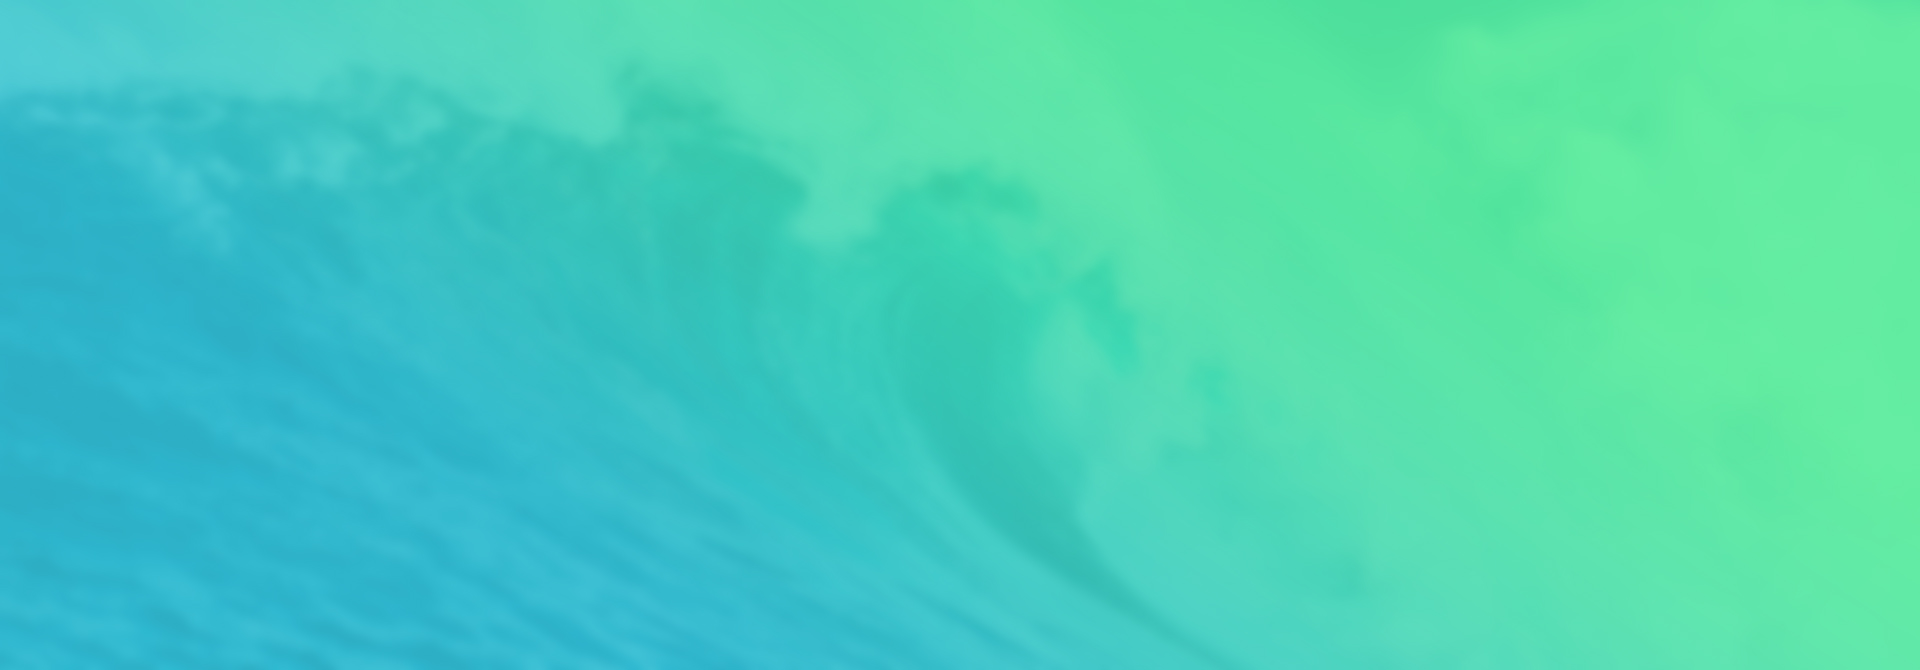 bg-blur-2